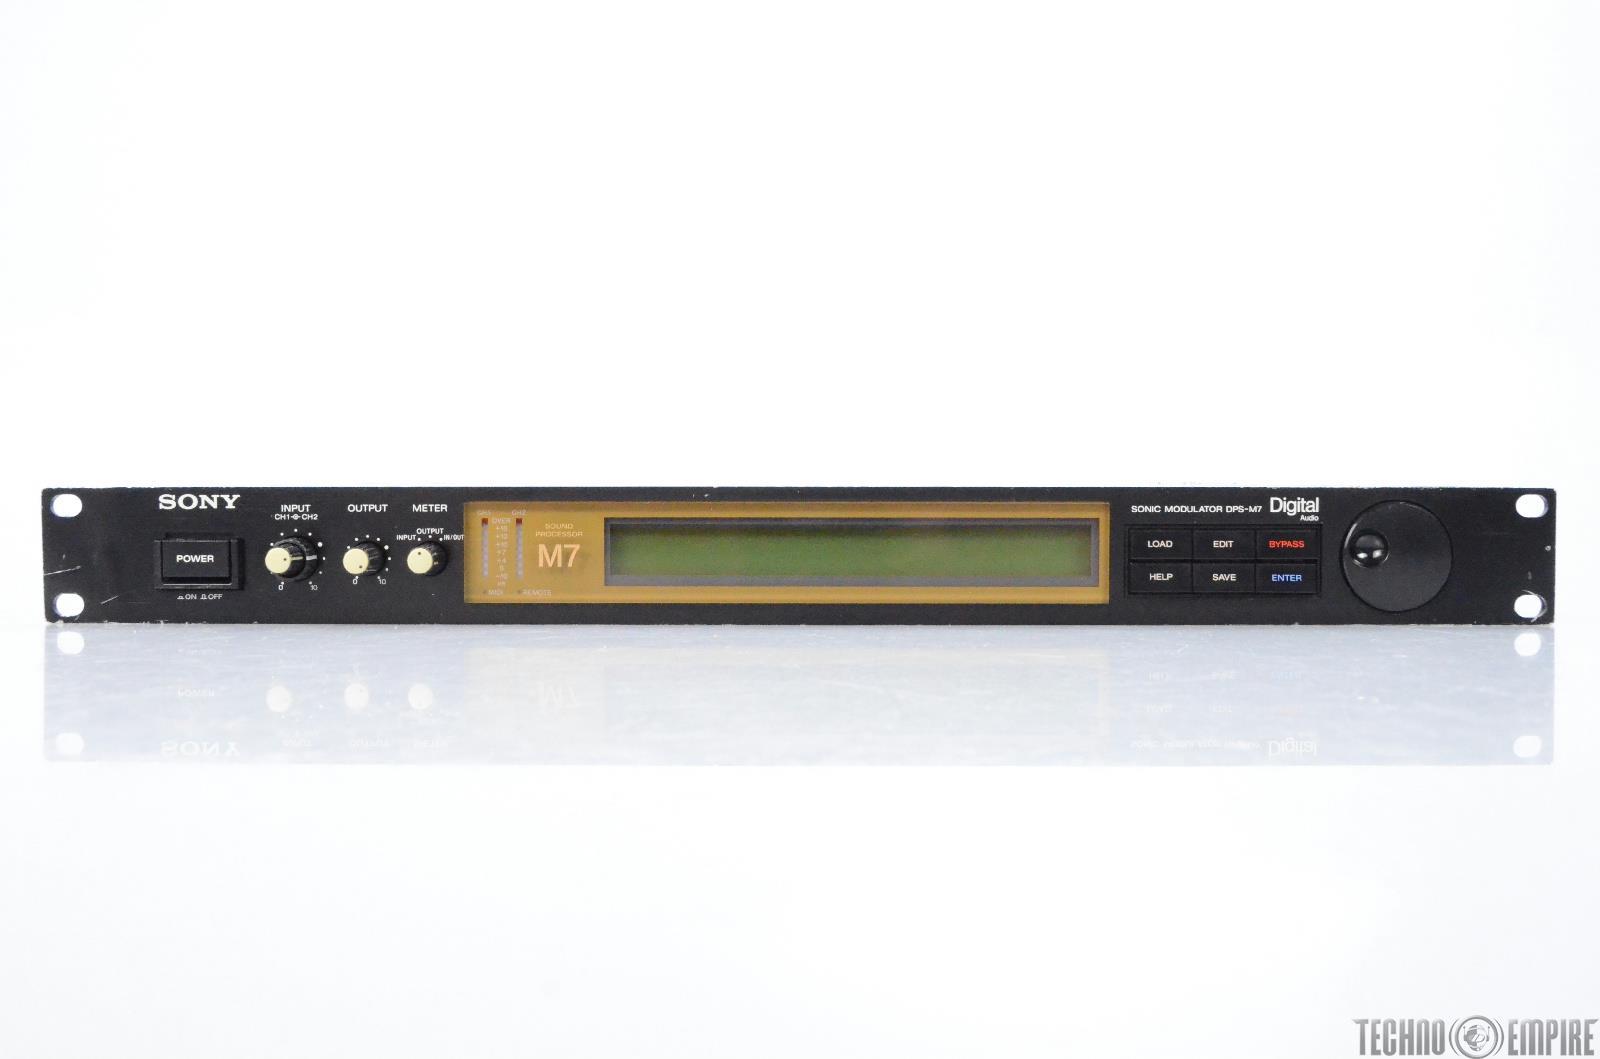 Sony DPS M7 Sonic Modulator Digital Sound Processor #28381